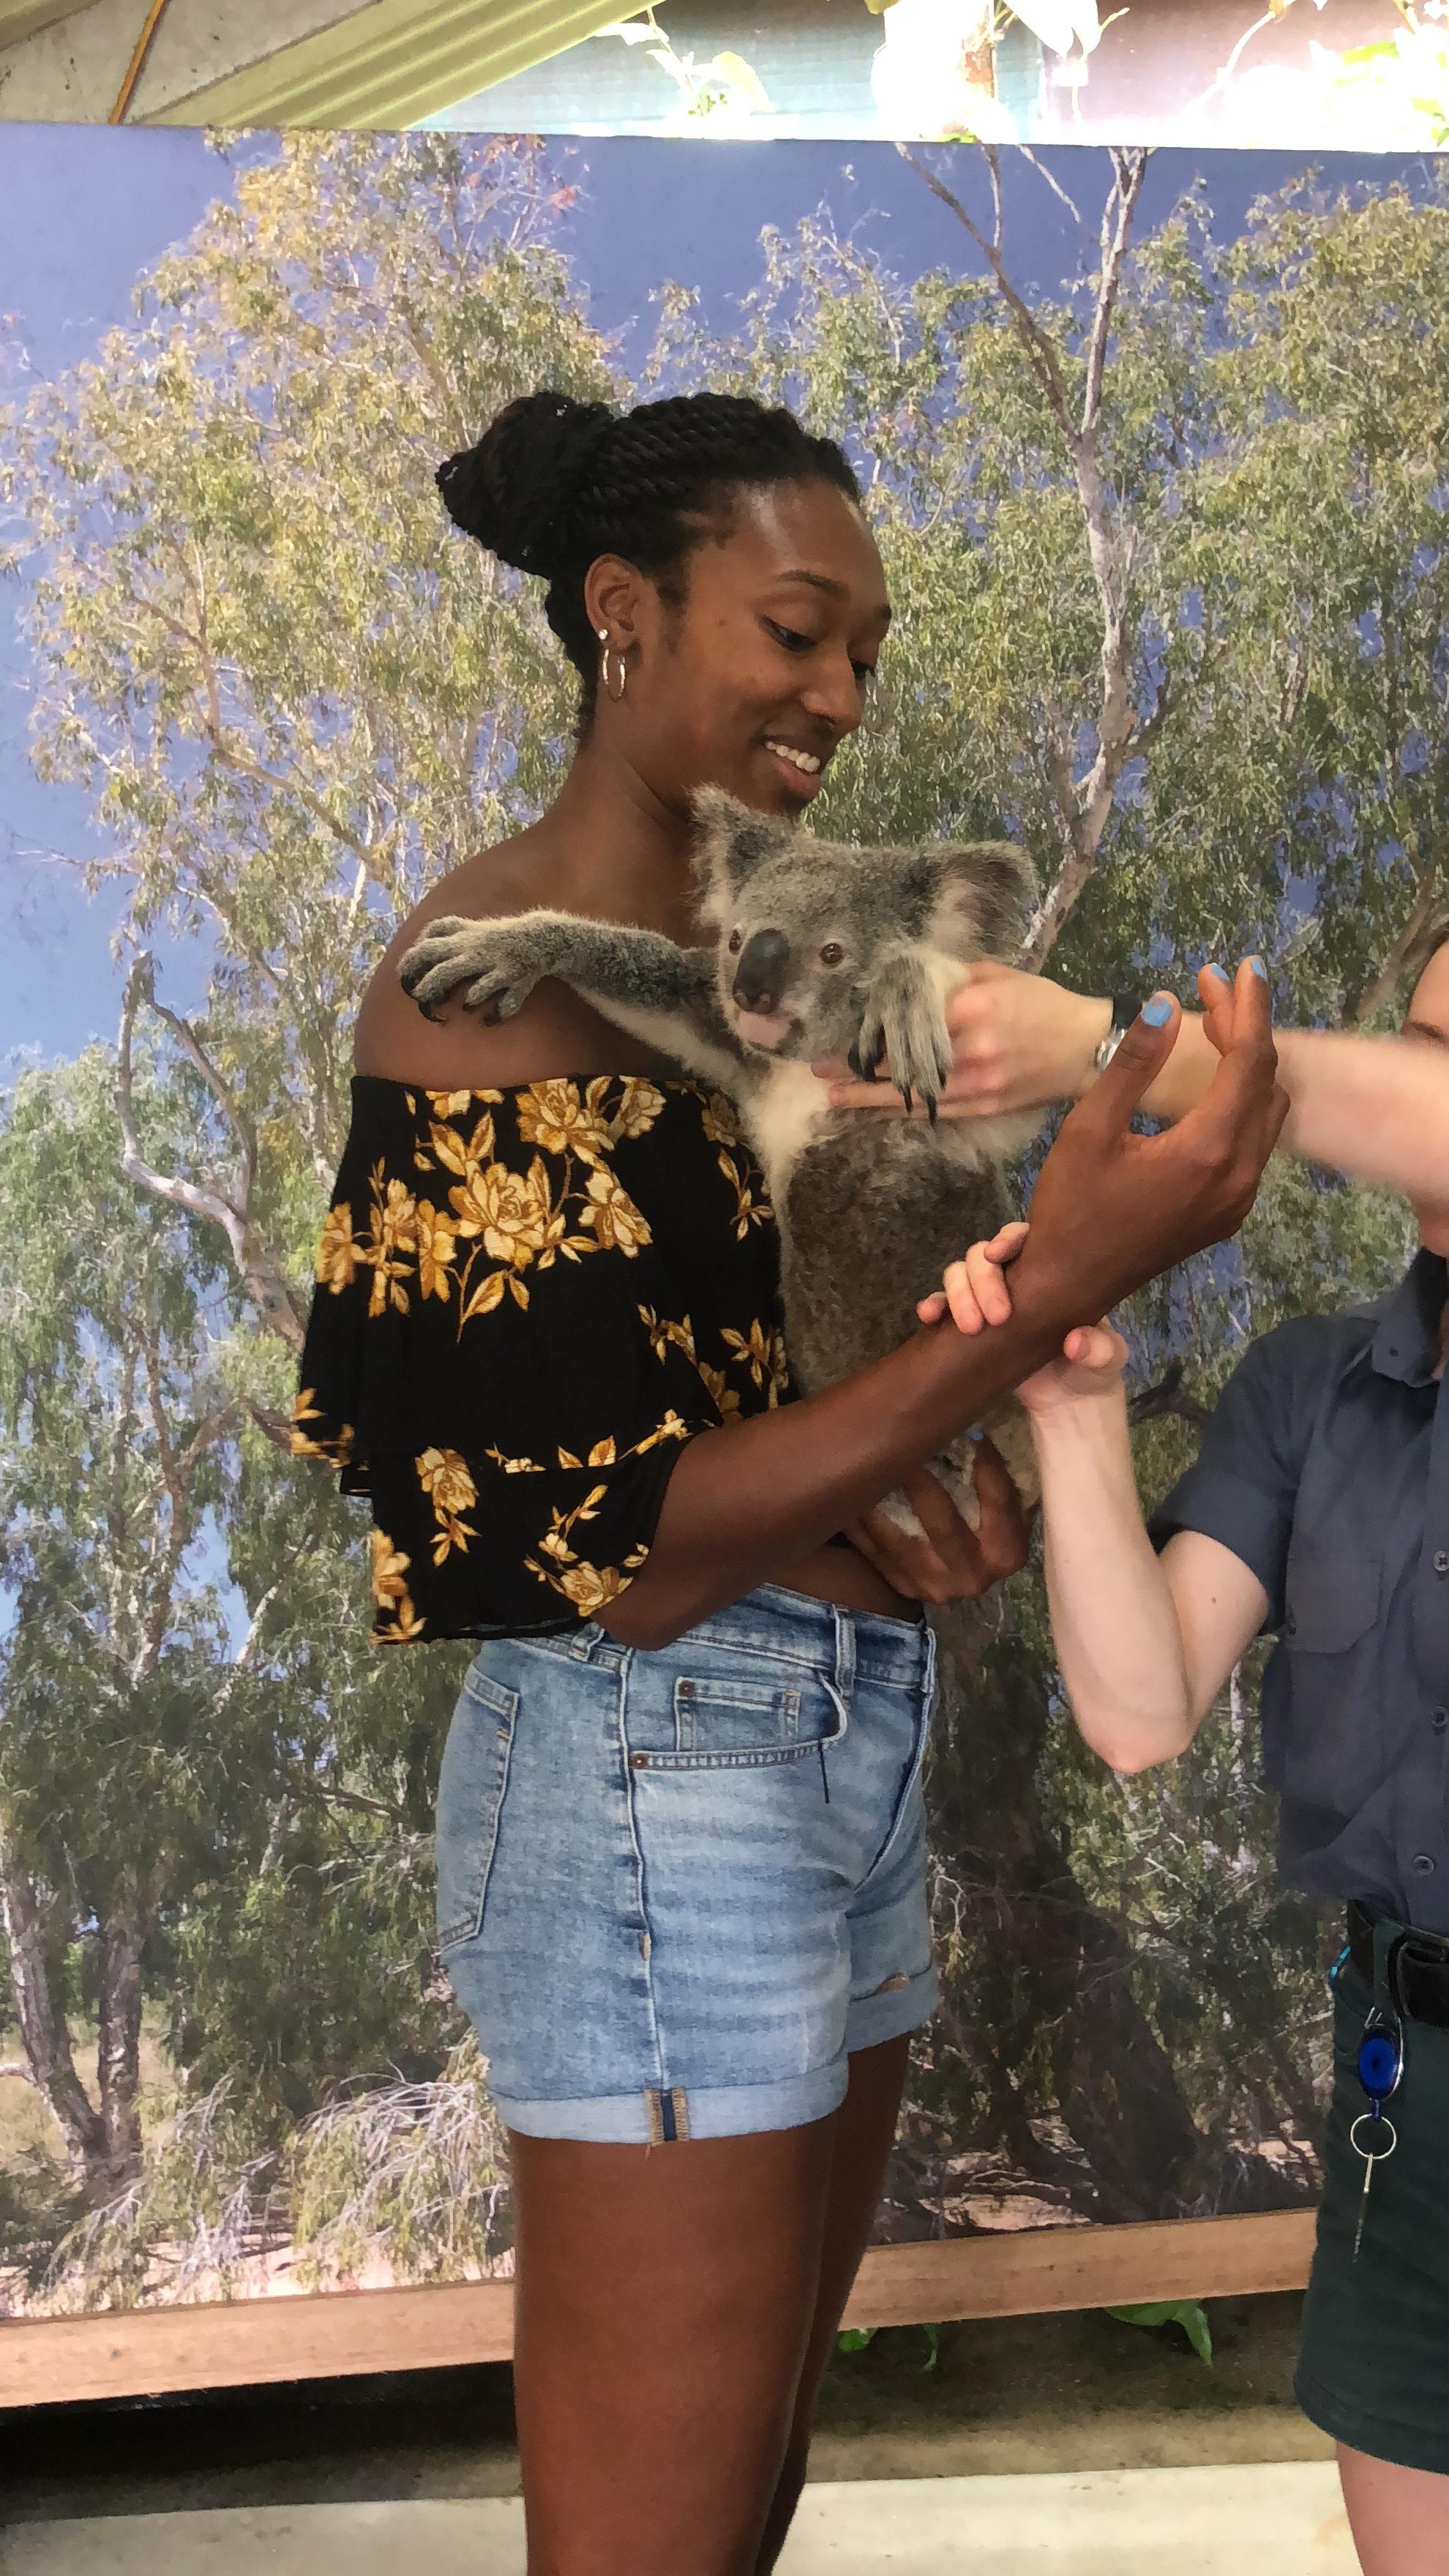 Ahhhh, I am about to hold a Koala Bear!!